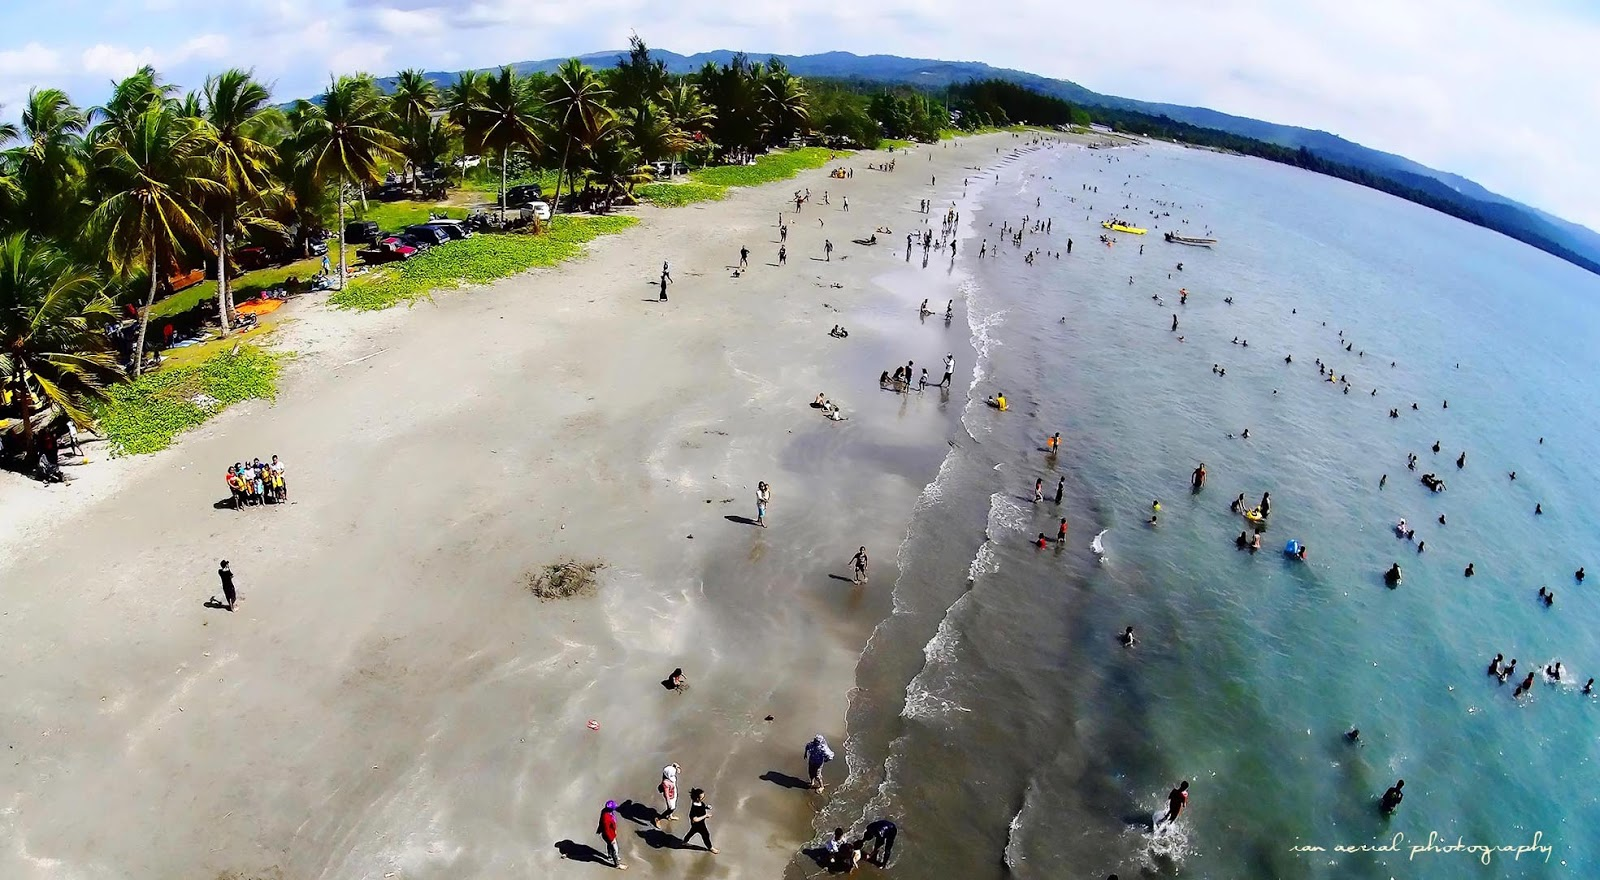 Tempat Wisata Jayapura 13 Layak Sobat Kunjungi Pantai Hotekamp Hotelkamp